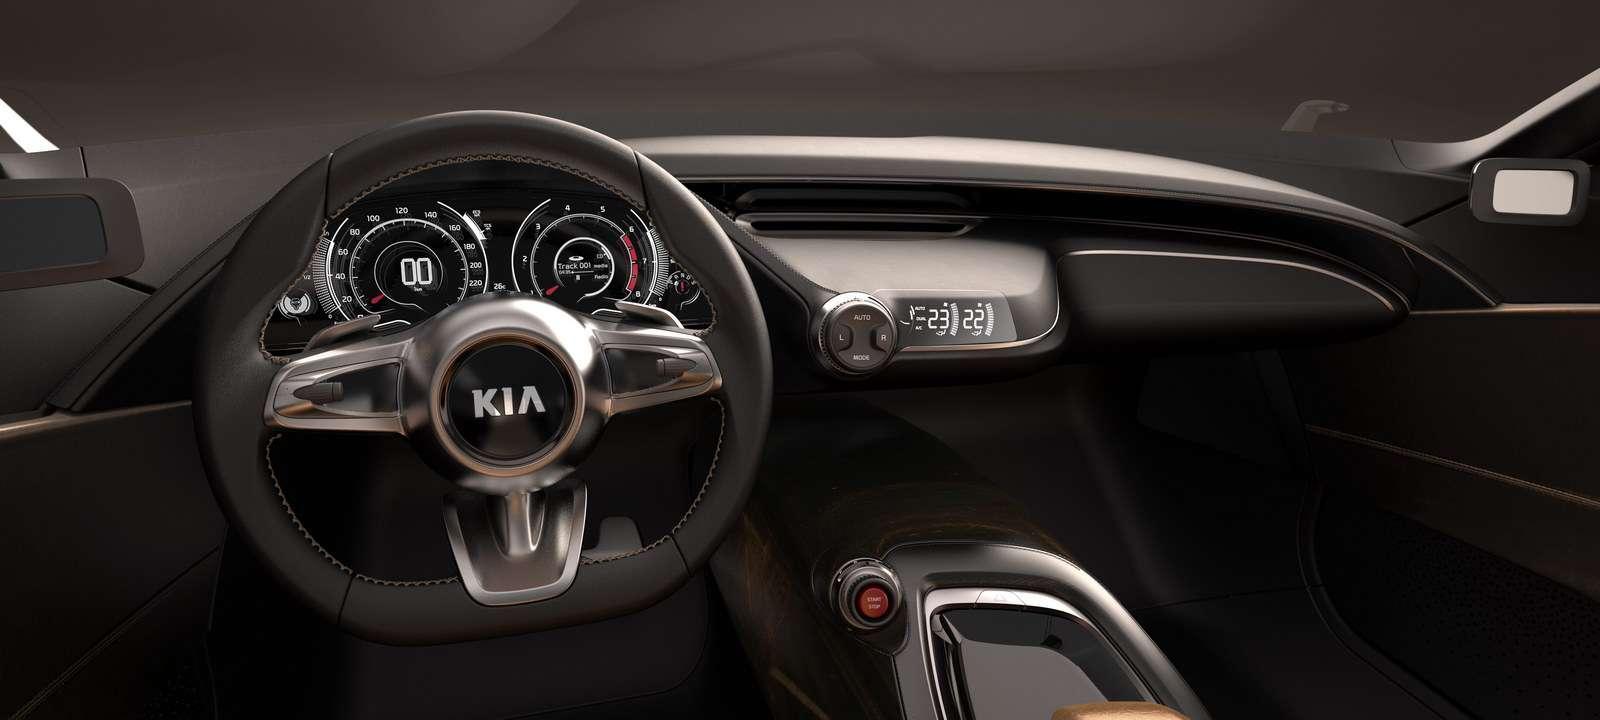 Kia GT Concept frankfurt 2011 wrzesien 2011